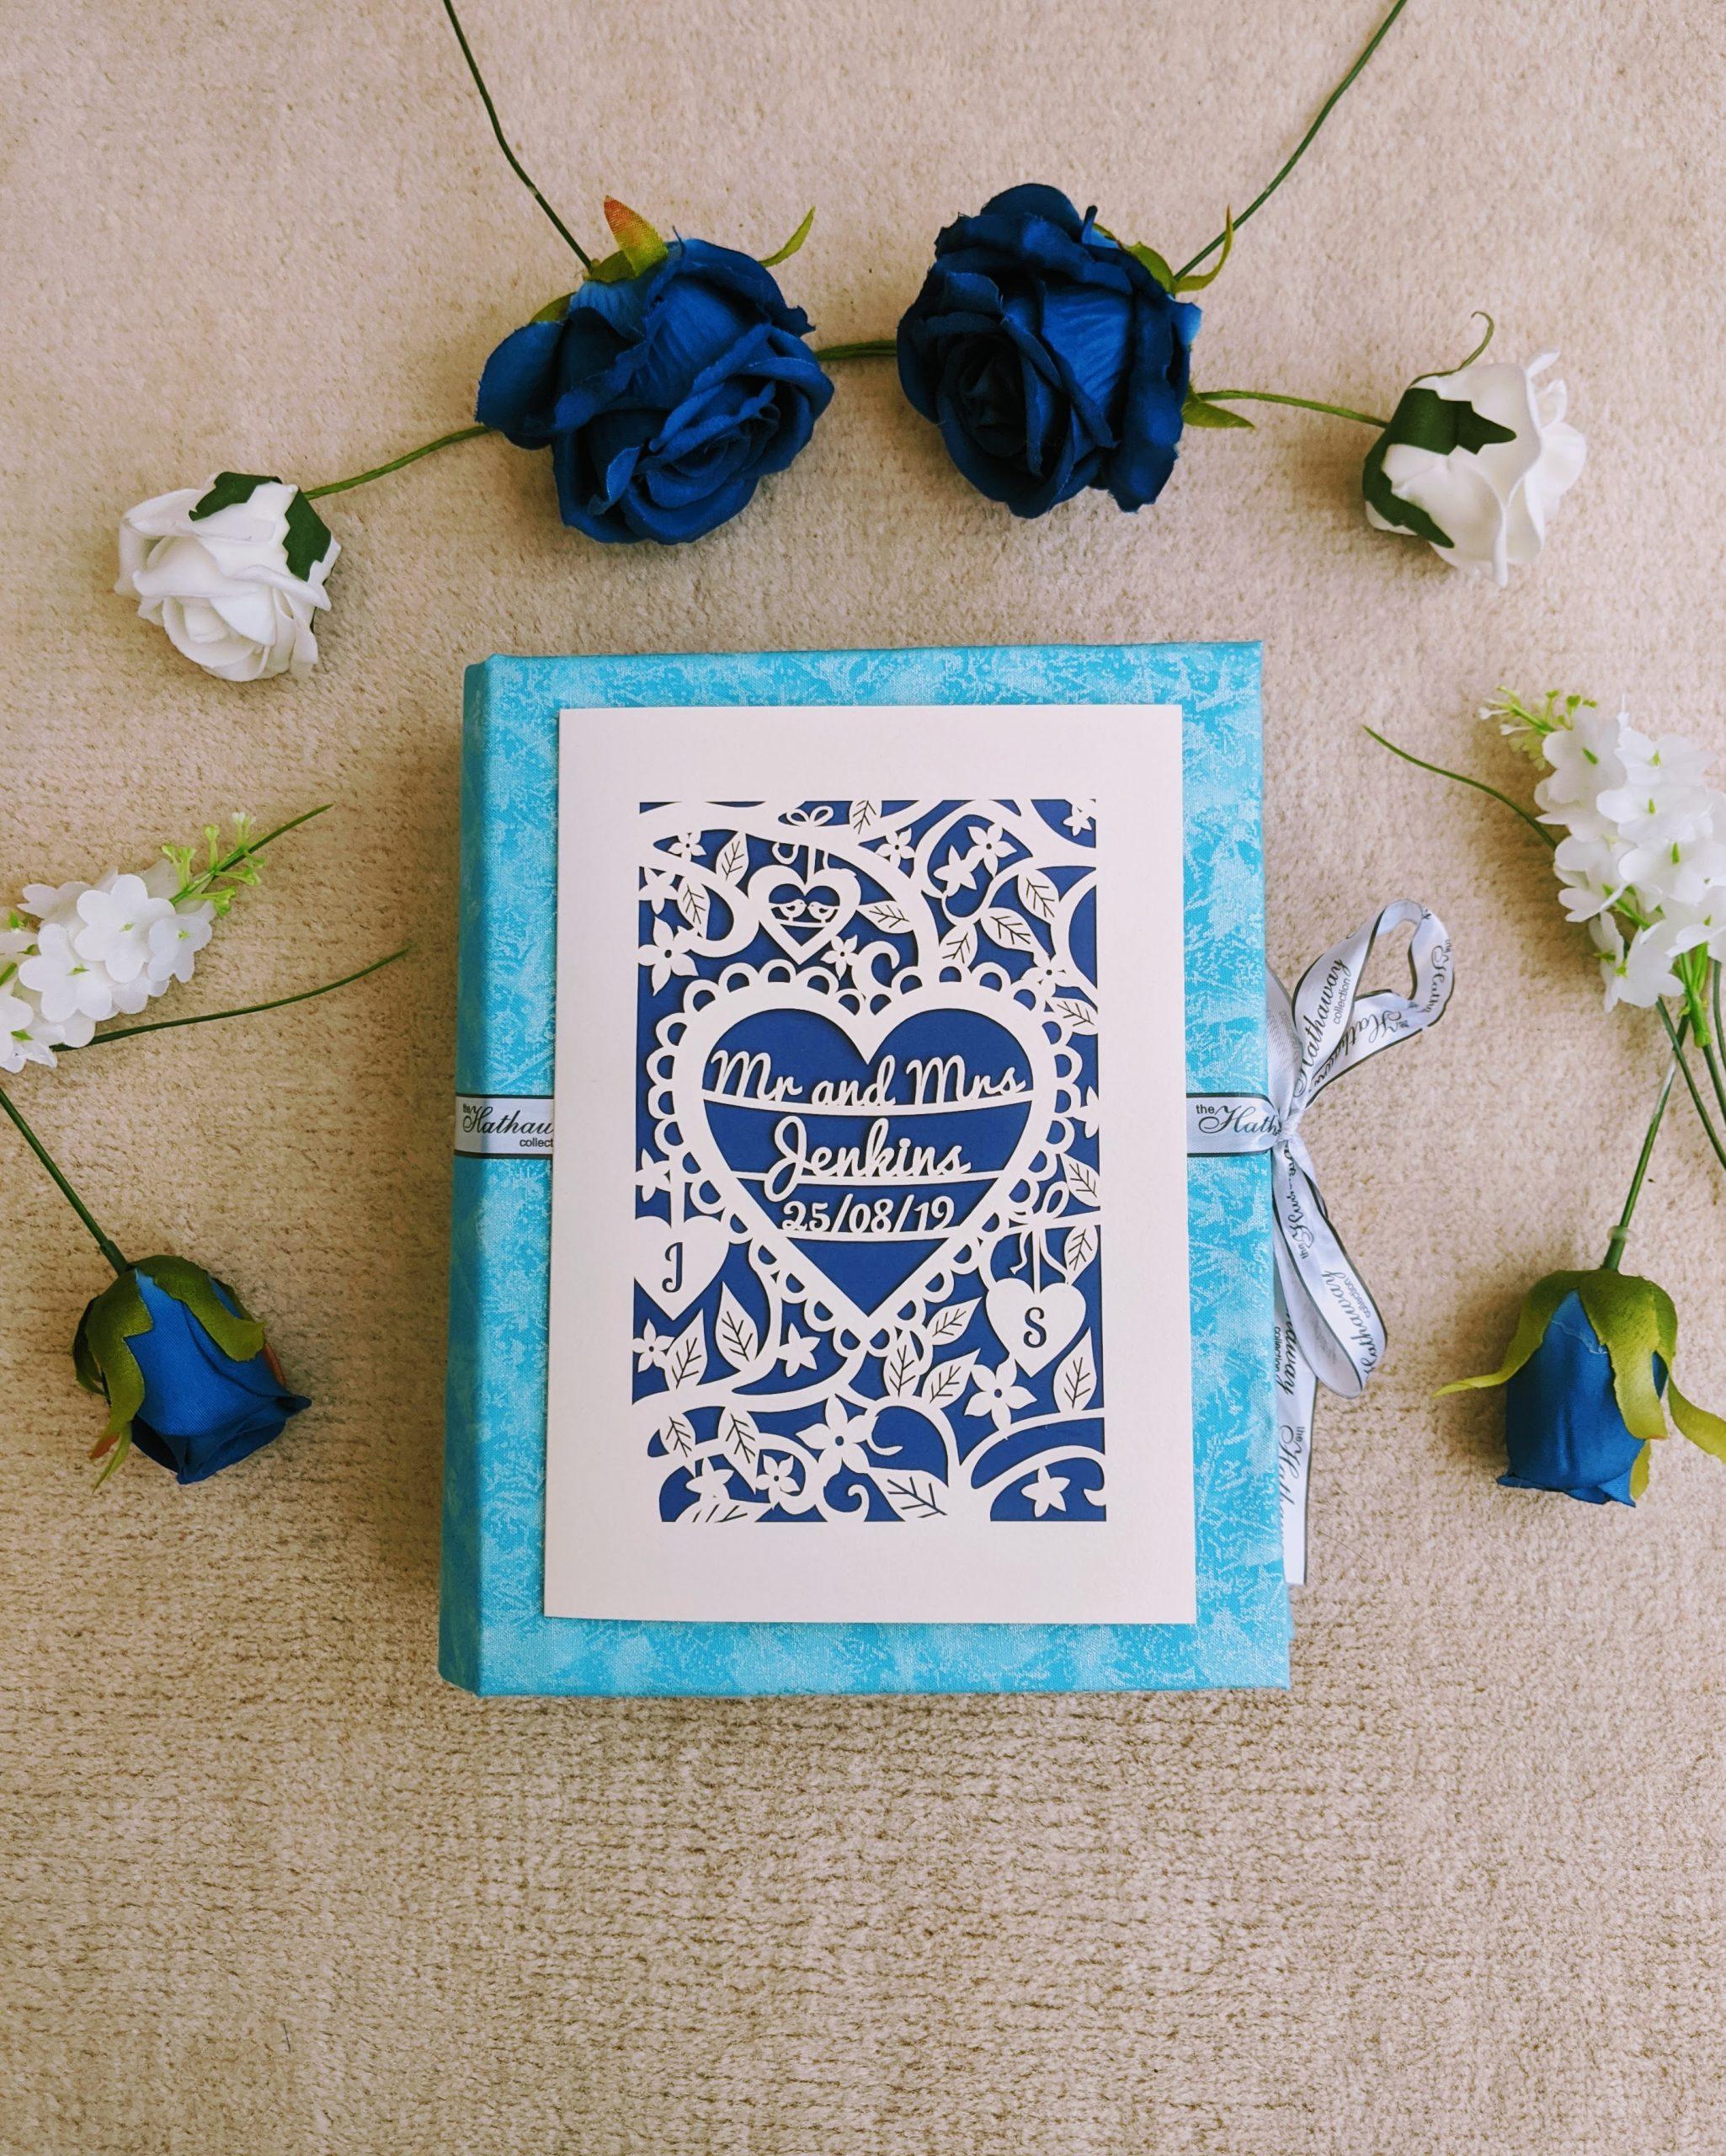 Finished DIY wedding card keepsake book